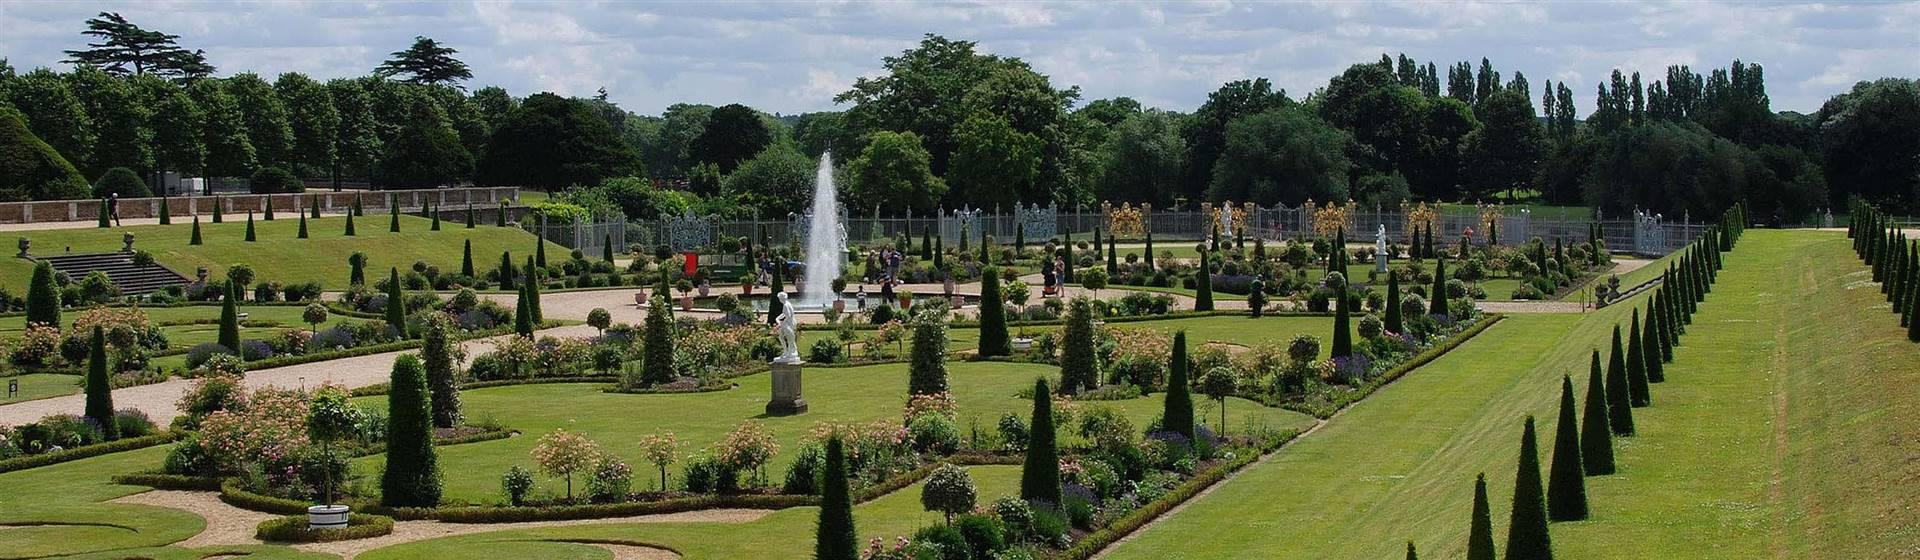 Hampton Court Flower Show & Kew Gardens